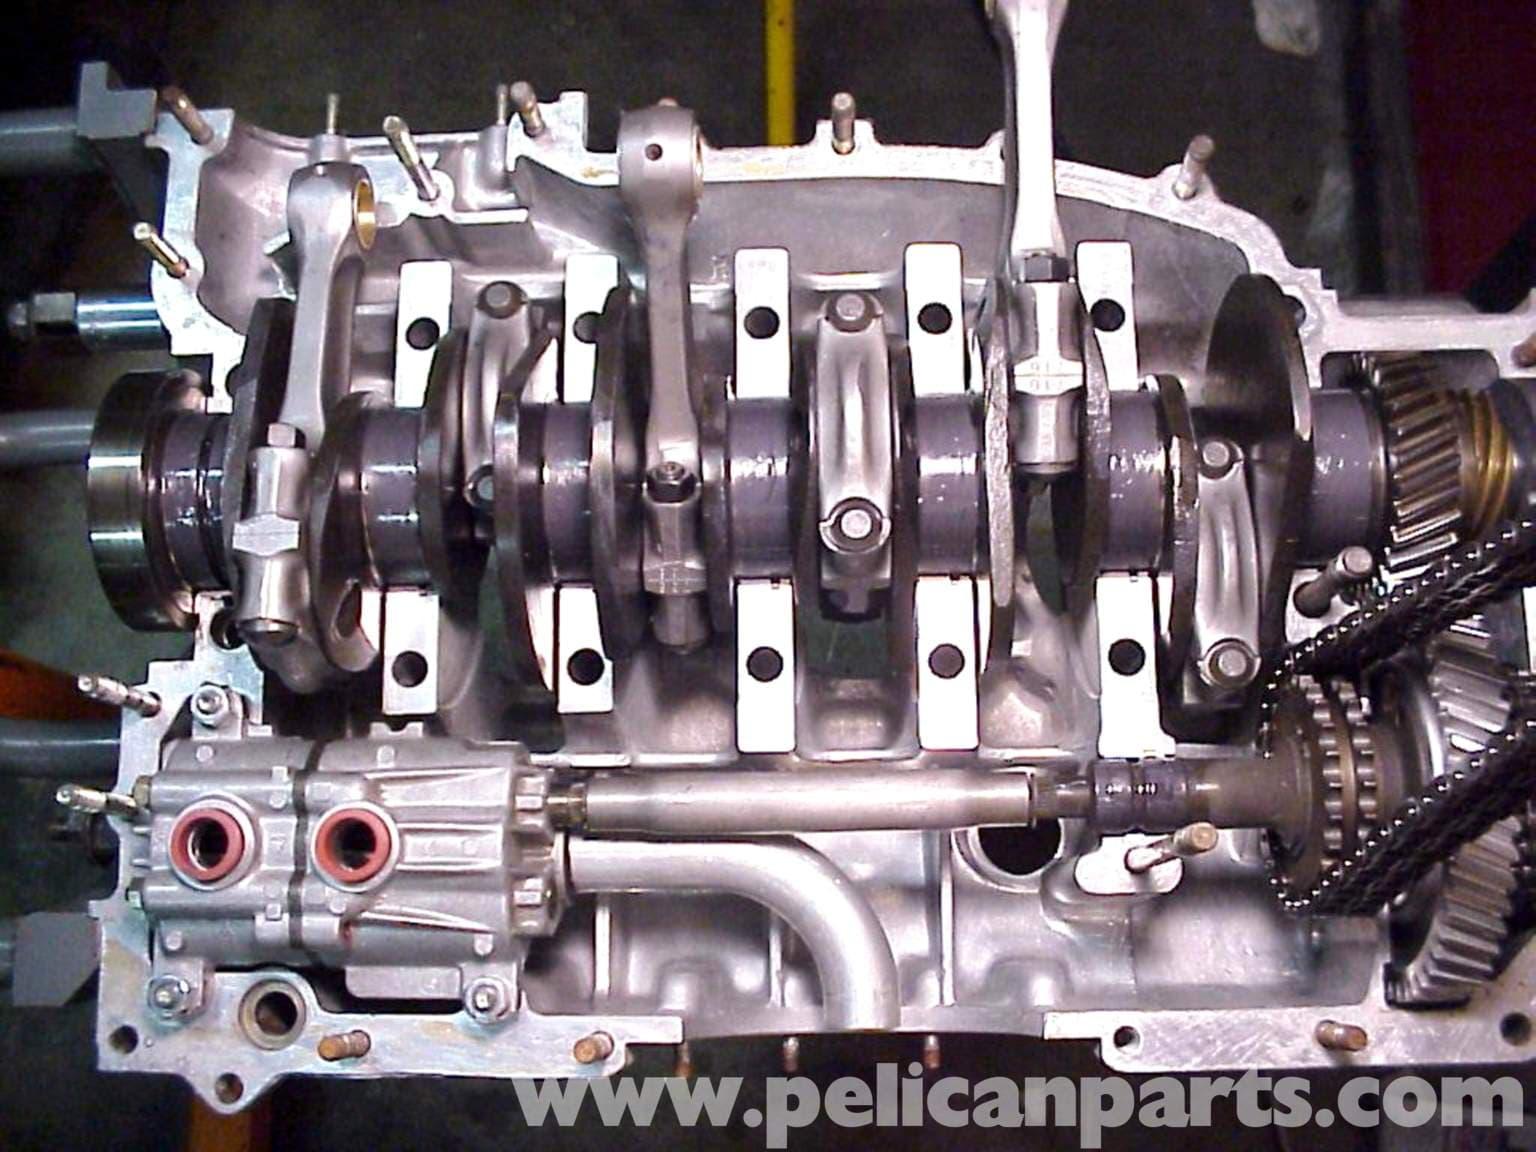 porsche rebuilding your engine turbo large image